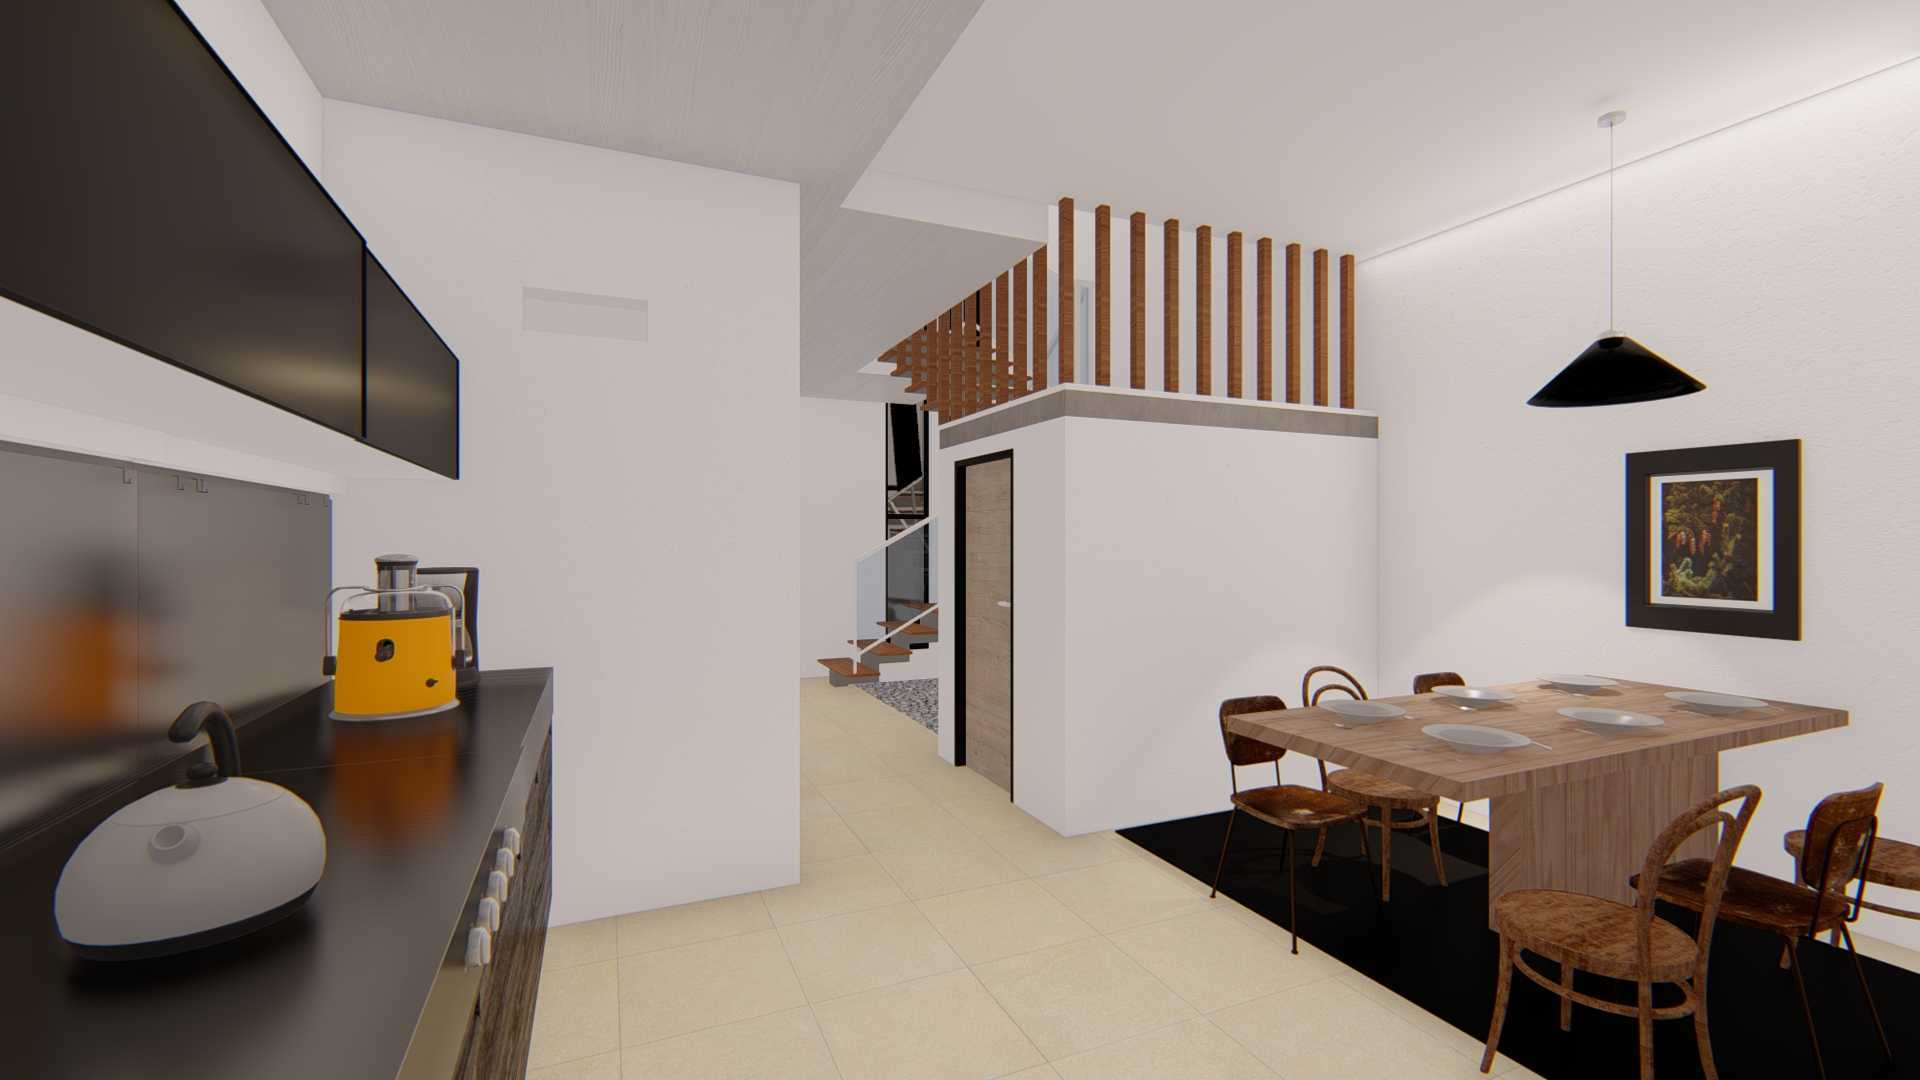 Suba-Arch Minimalist Modern Style House Kota Tgr. Sel., Kota Tangerang Selatan, Banten, Indonesia Kota Tgr. Sel., Kota Tangerang Selatan, Banten, Indonesia Suba-Arch-Minimalist-Modern-Style-House Minimalist 81023